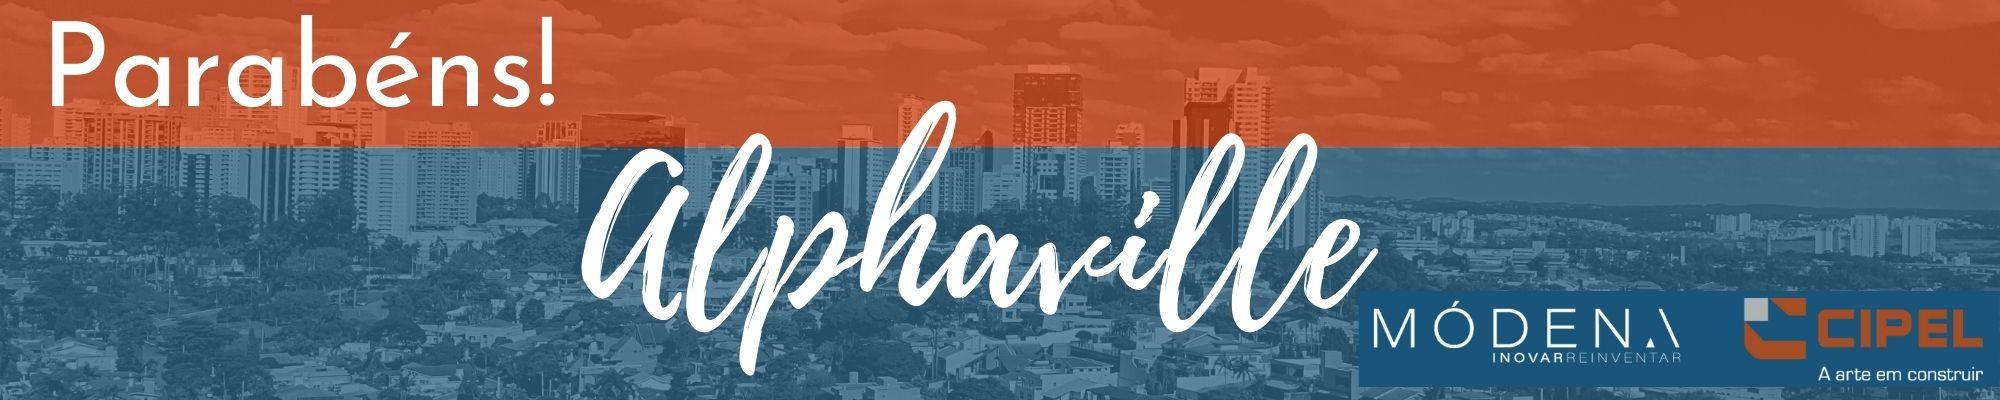 MódenaCipel celebra o aniversário de Alphaville